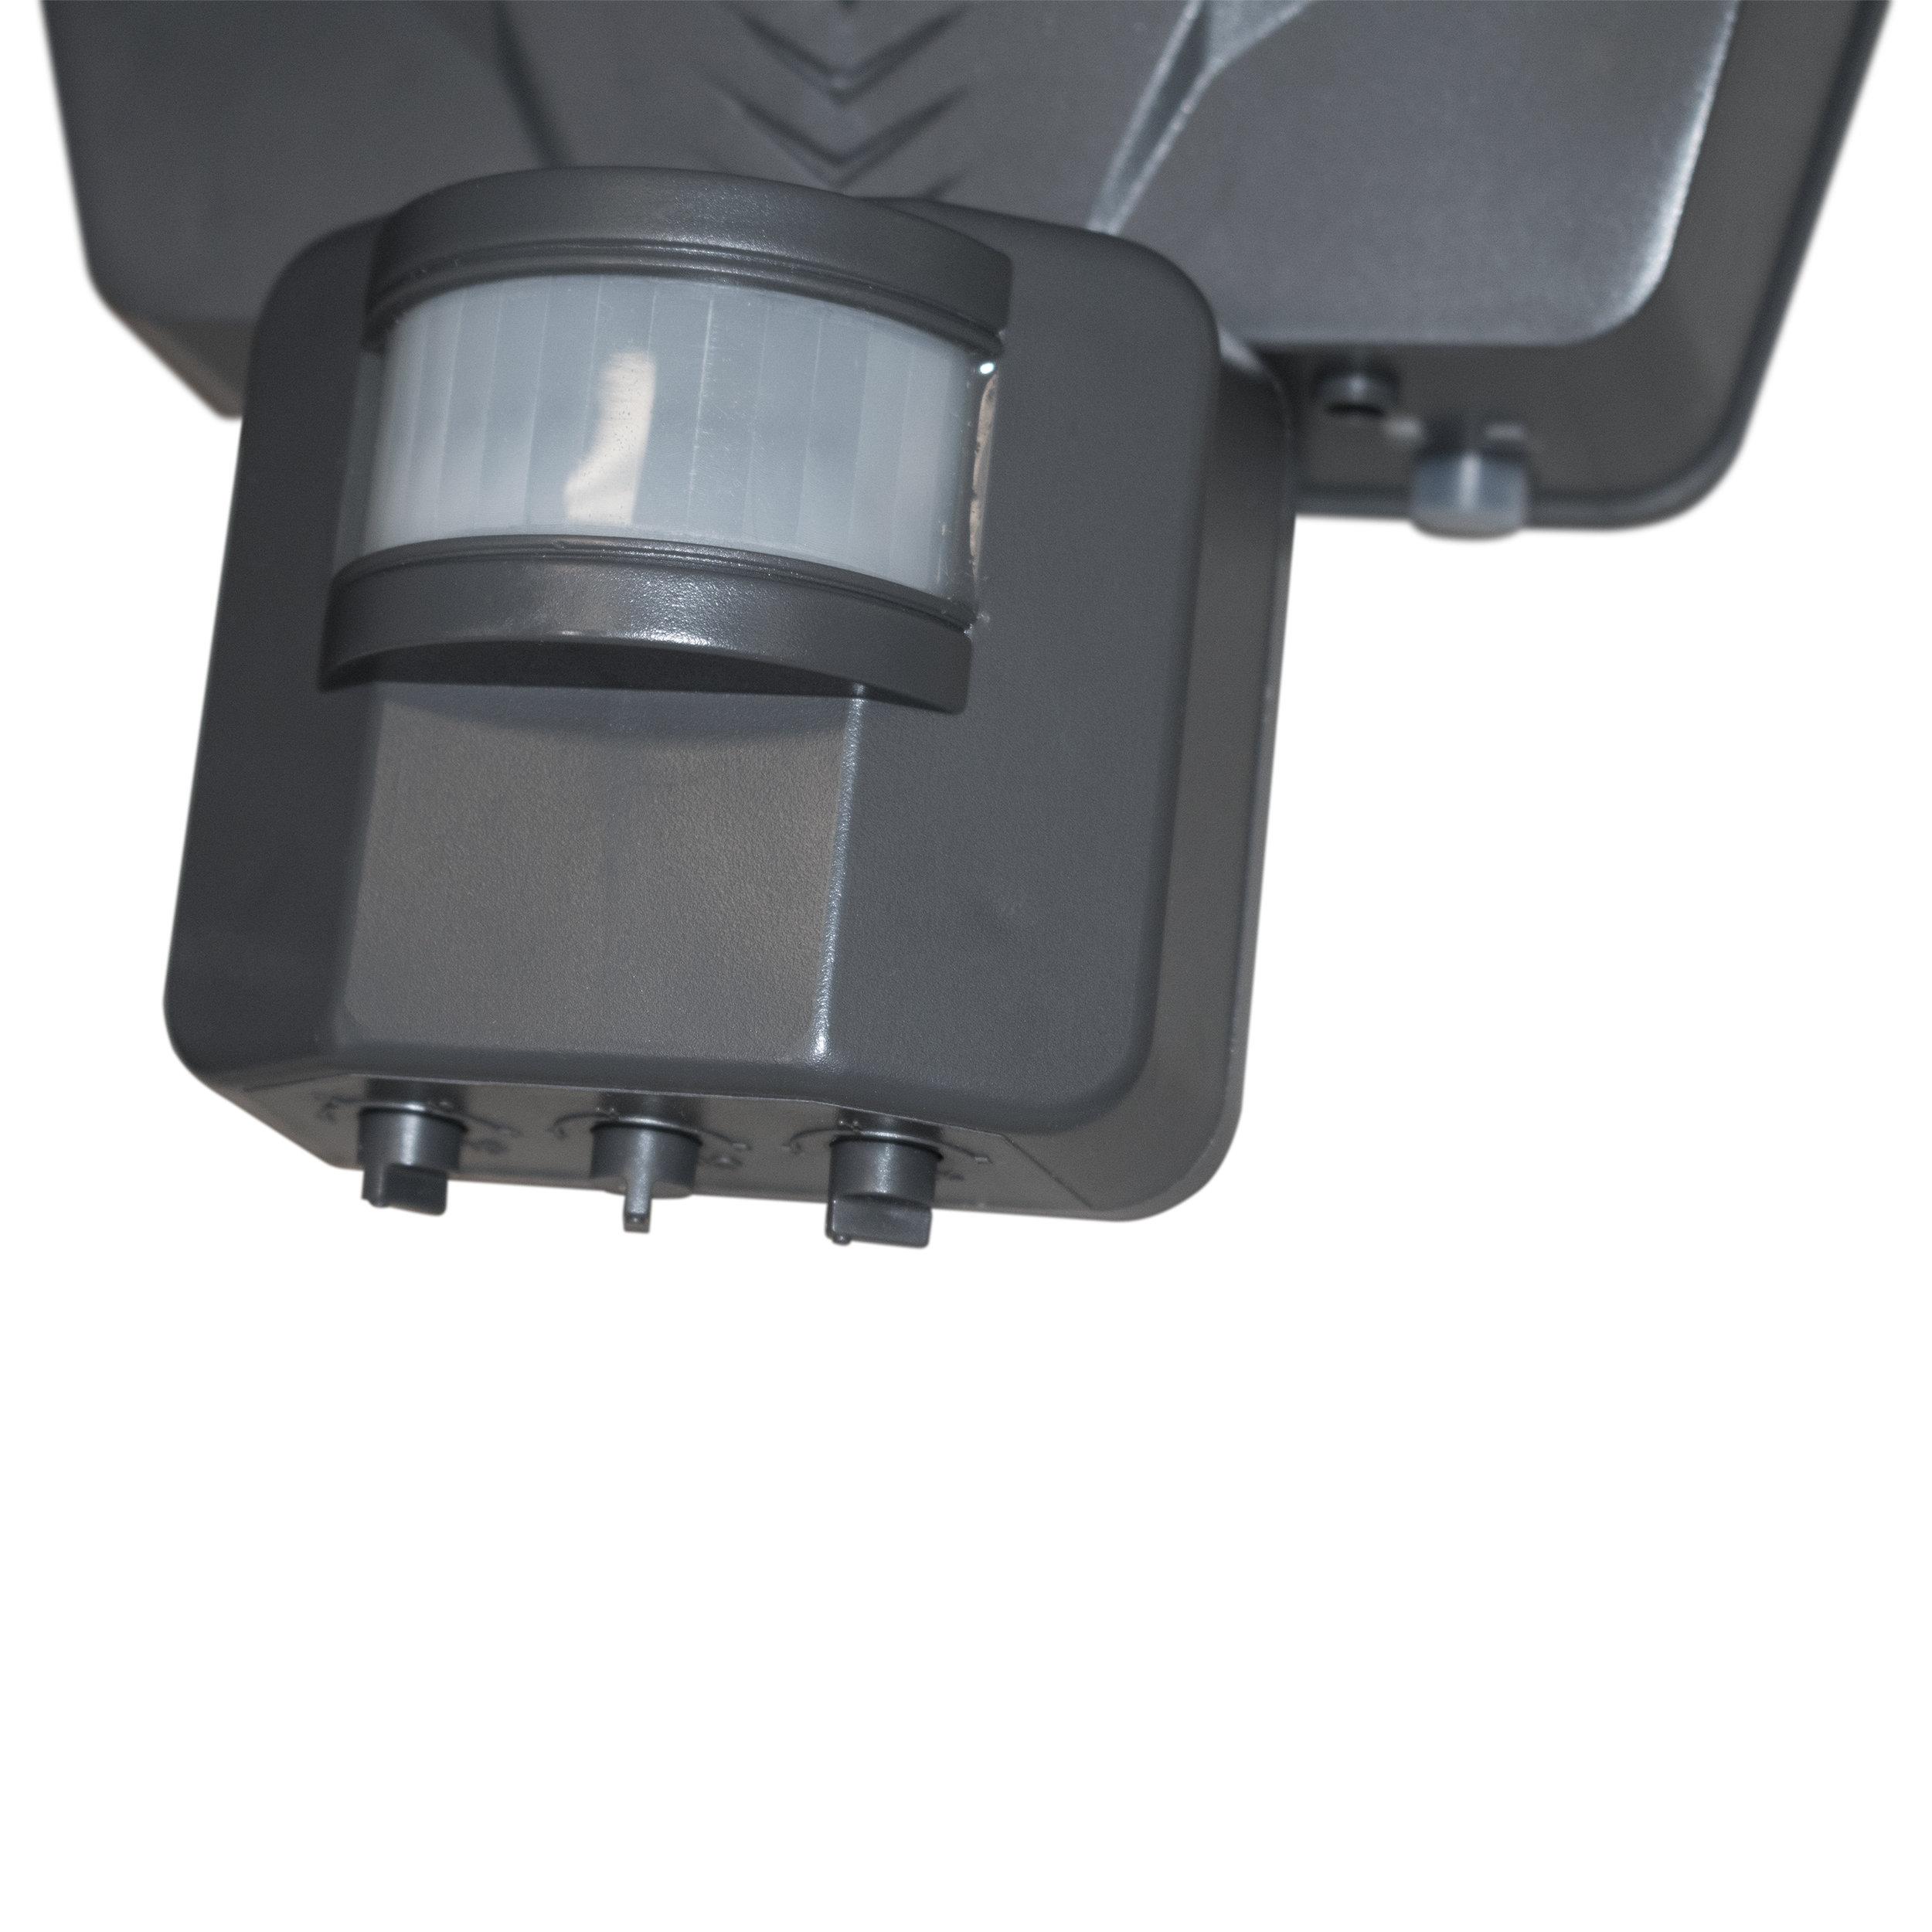 Novolink NL-DSG2 Solar Security Light, Motion Sensor with Dials